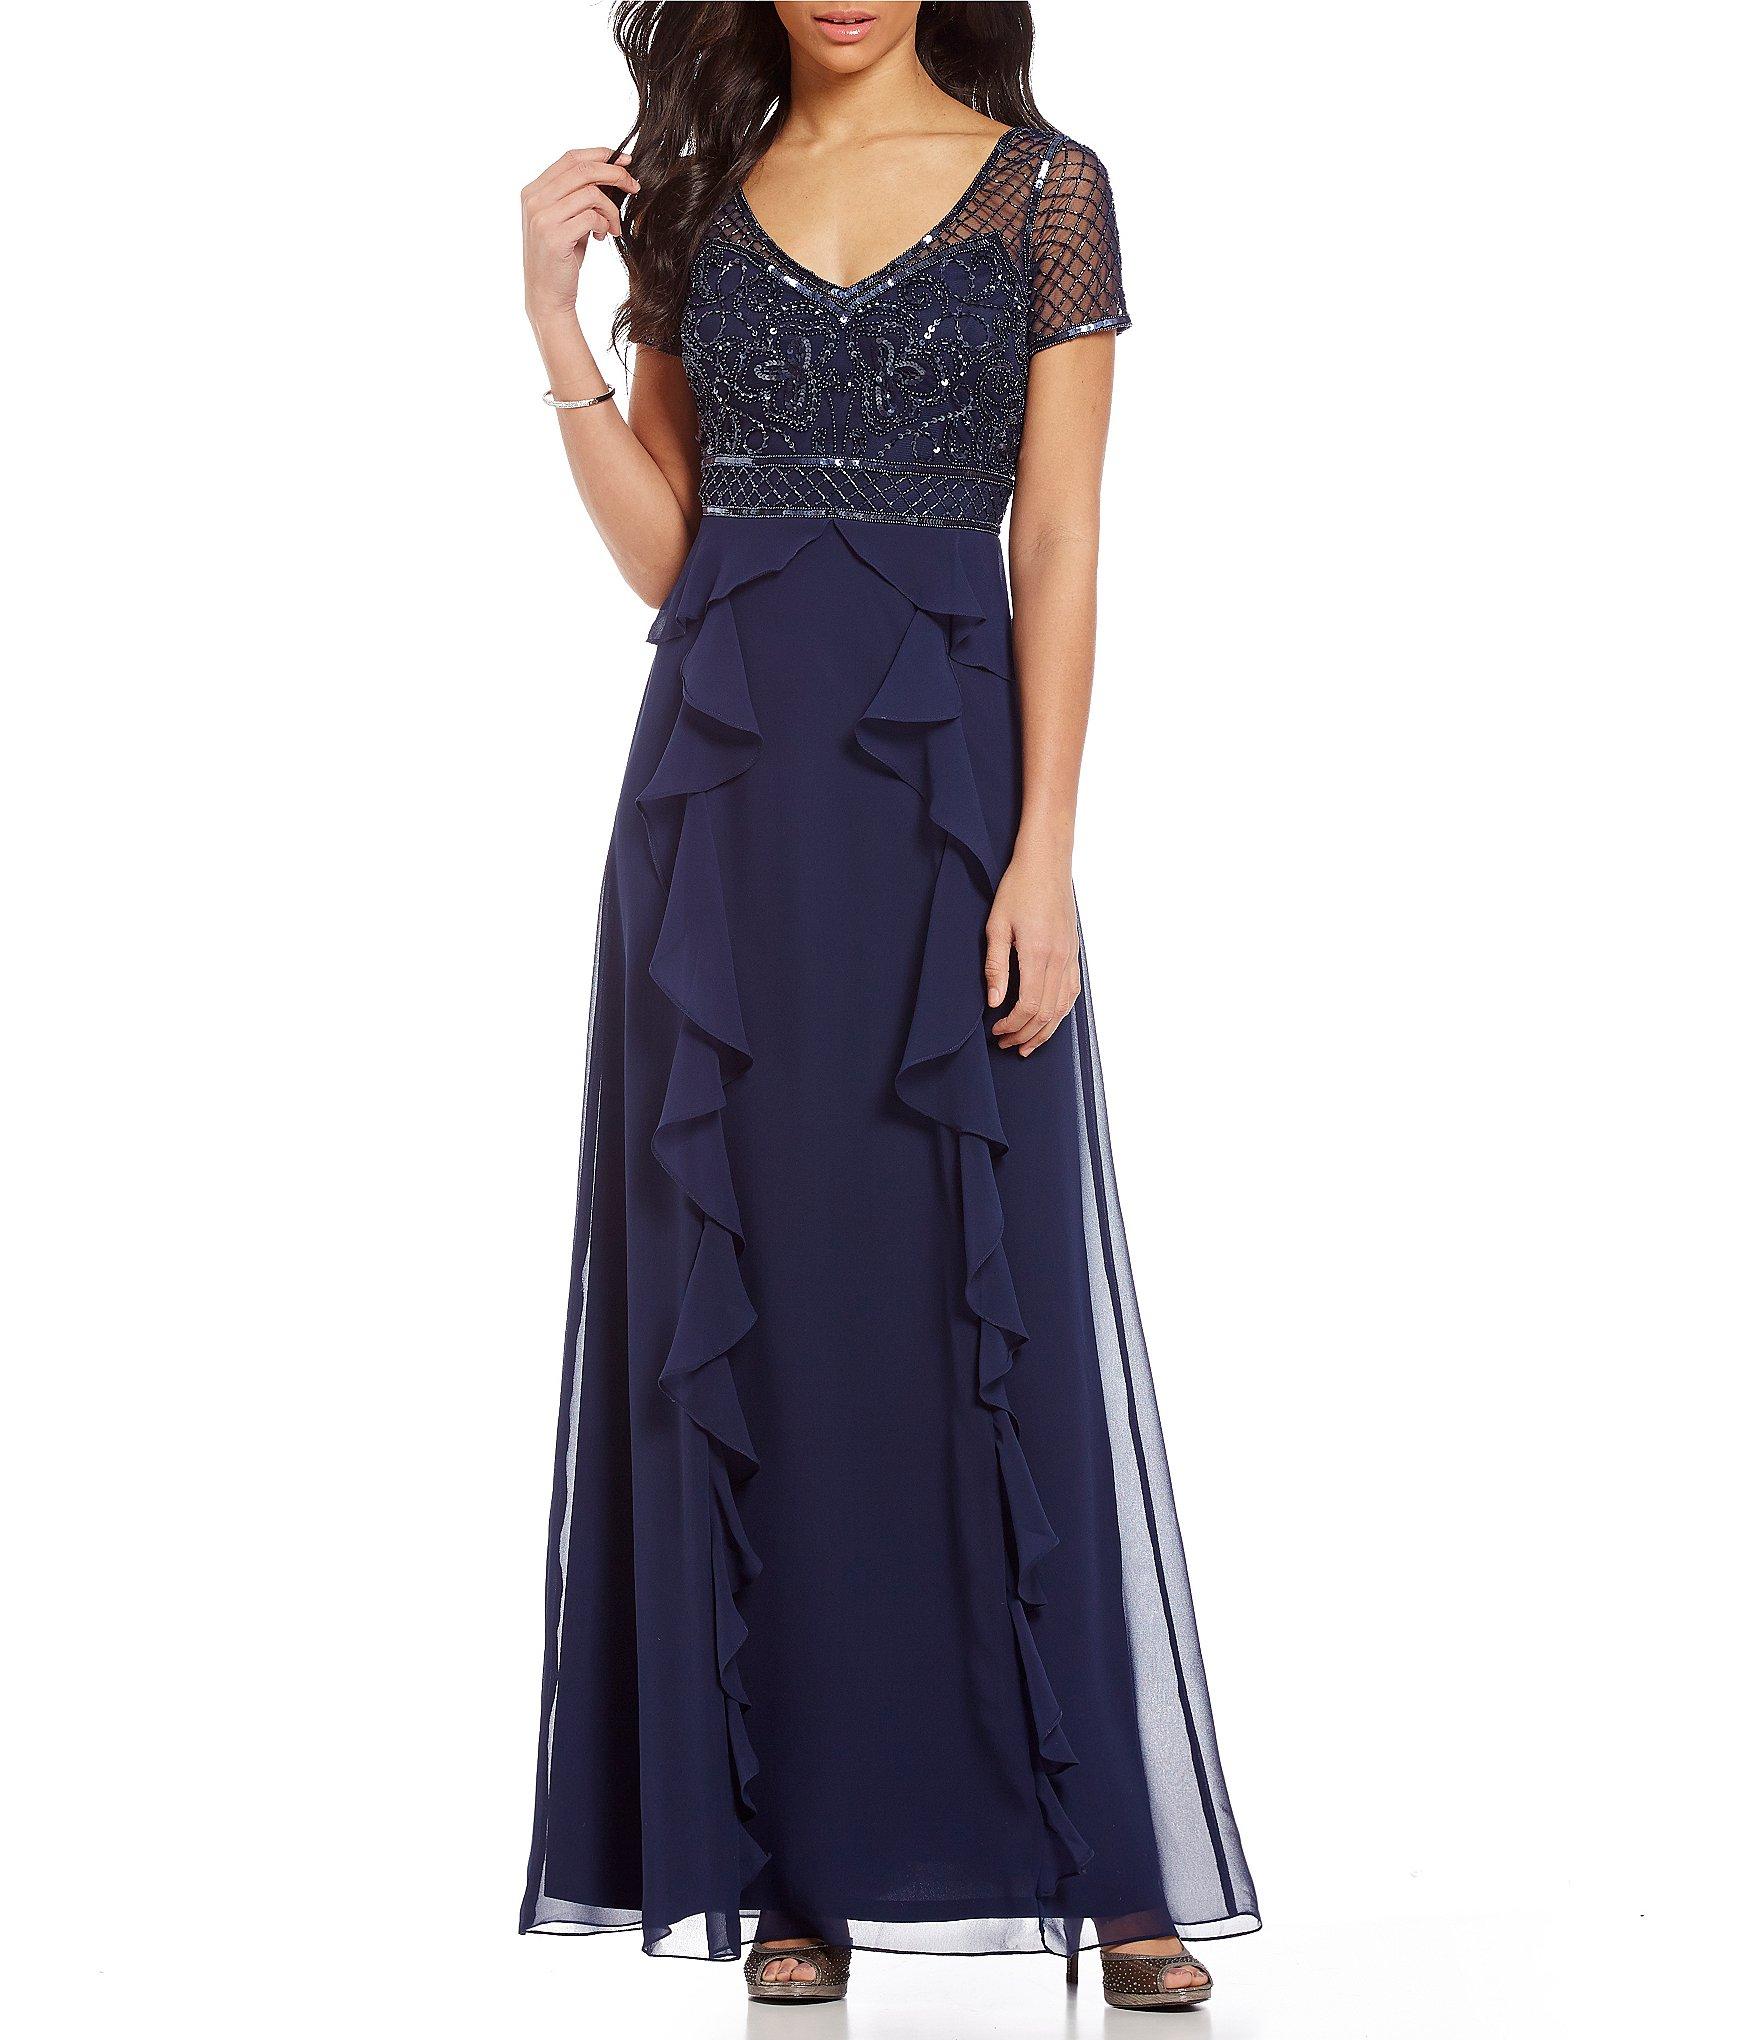 Adrianna Papell Petite Beaded Bodice Ruffled Gown Dillards